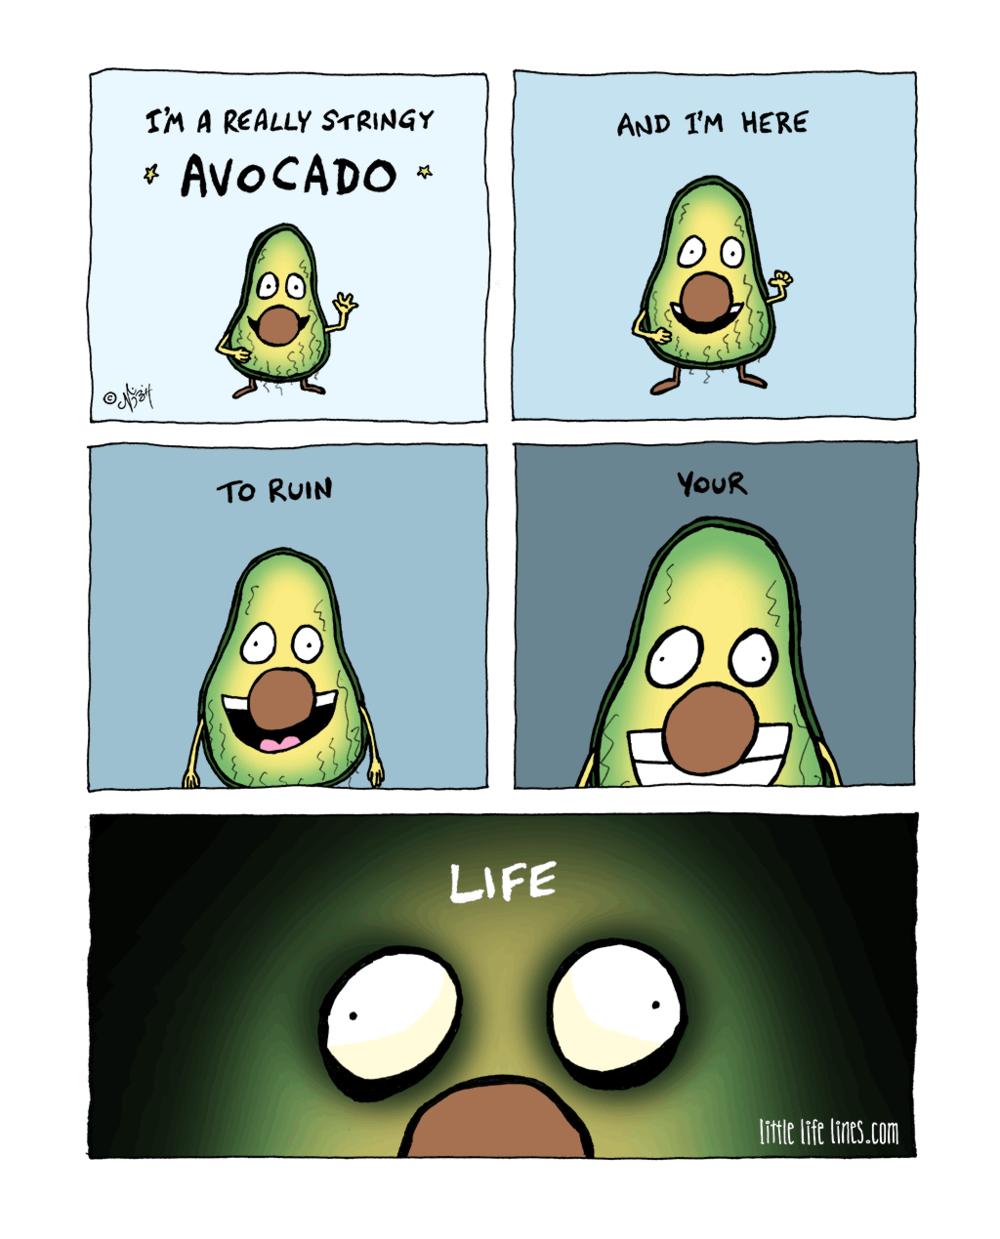 Stringy avocado will ruin your life